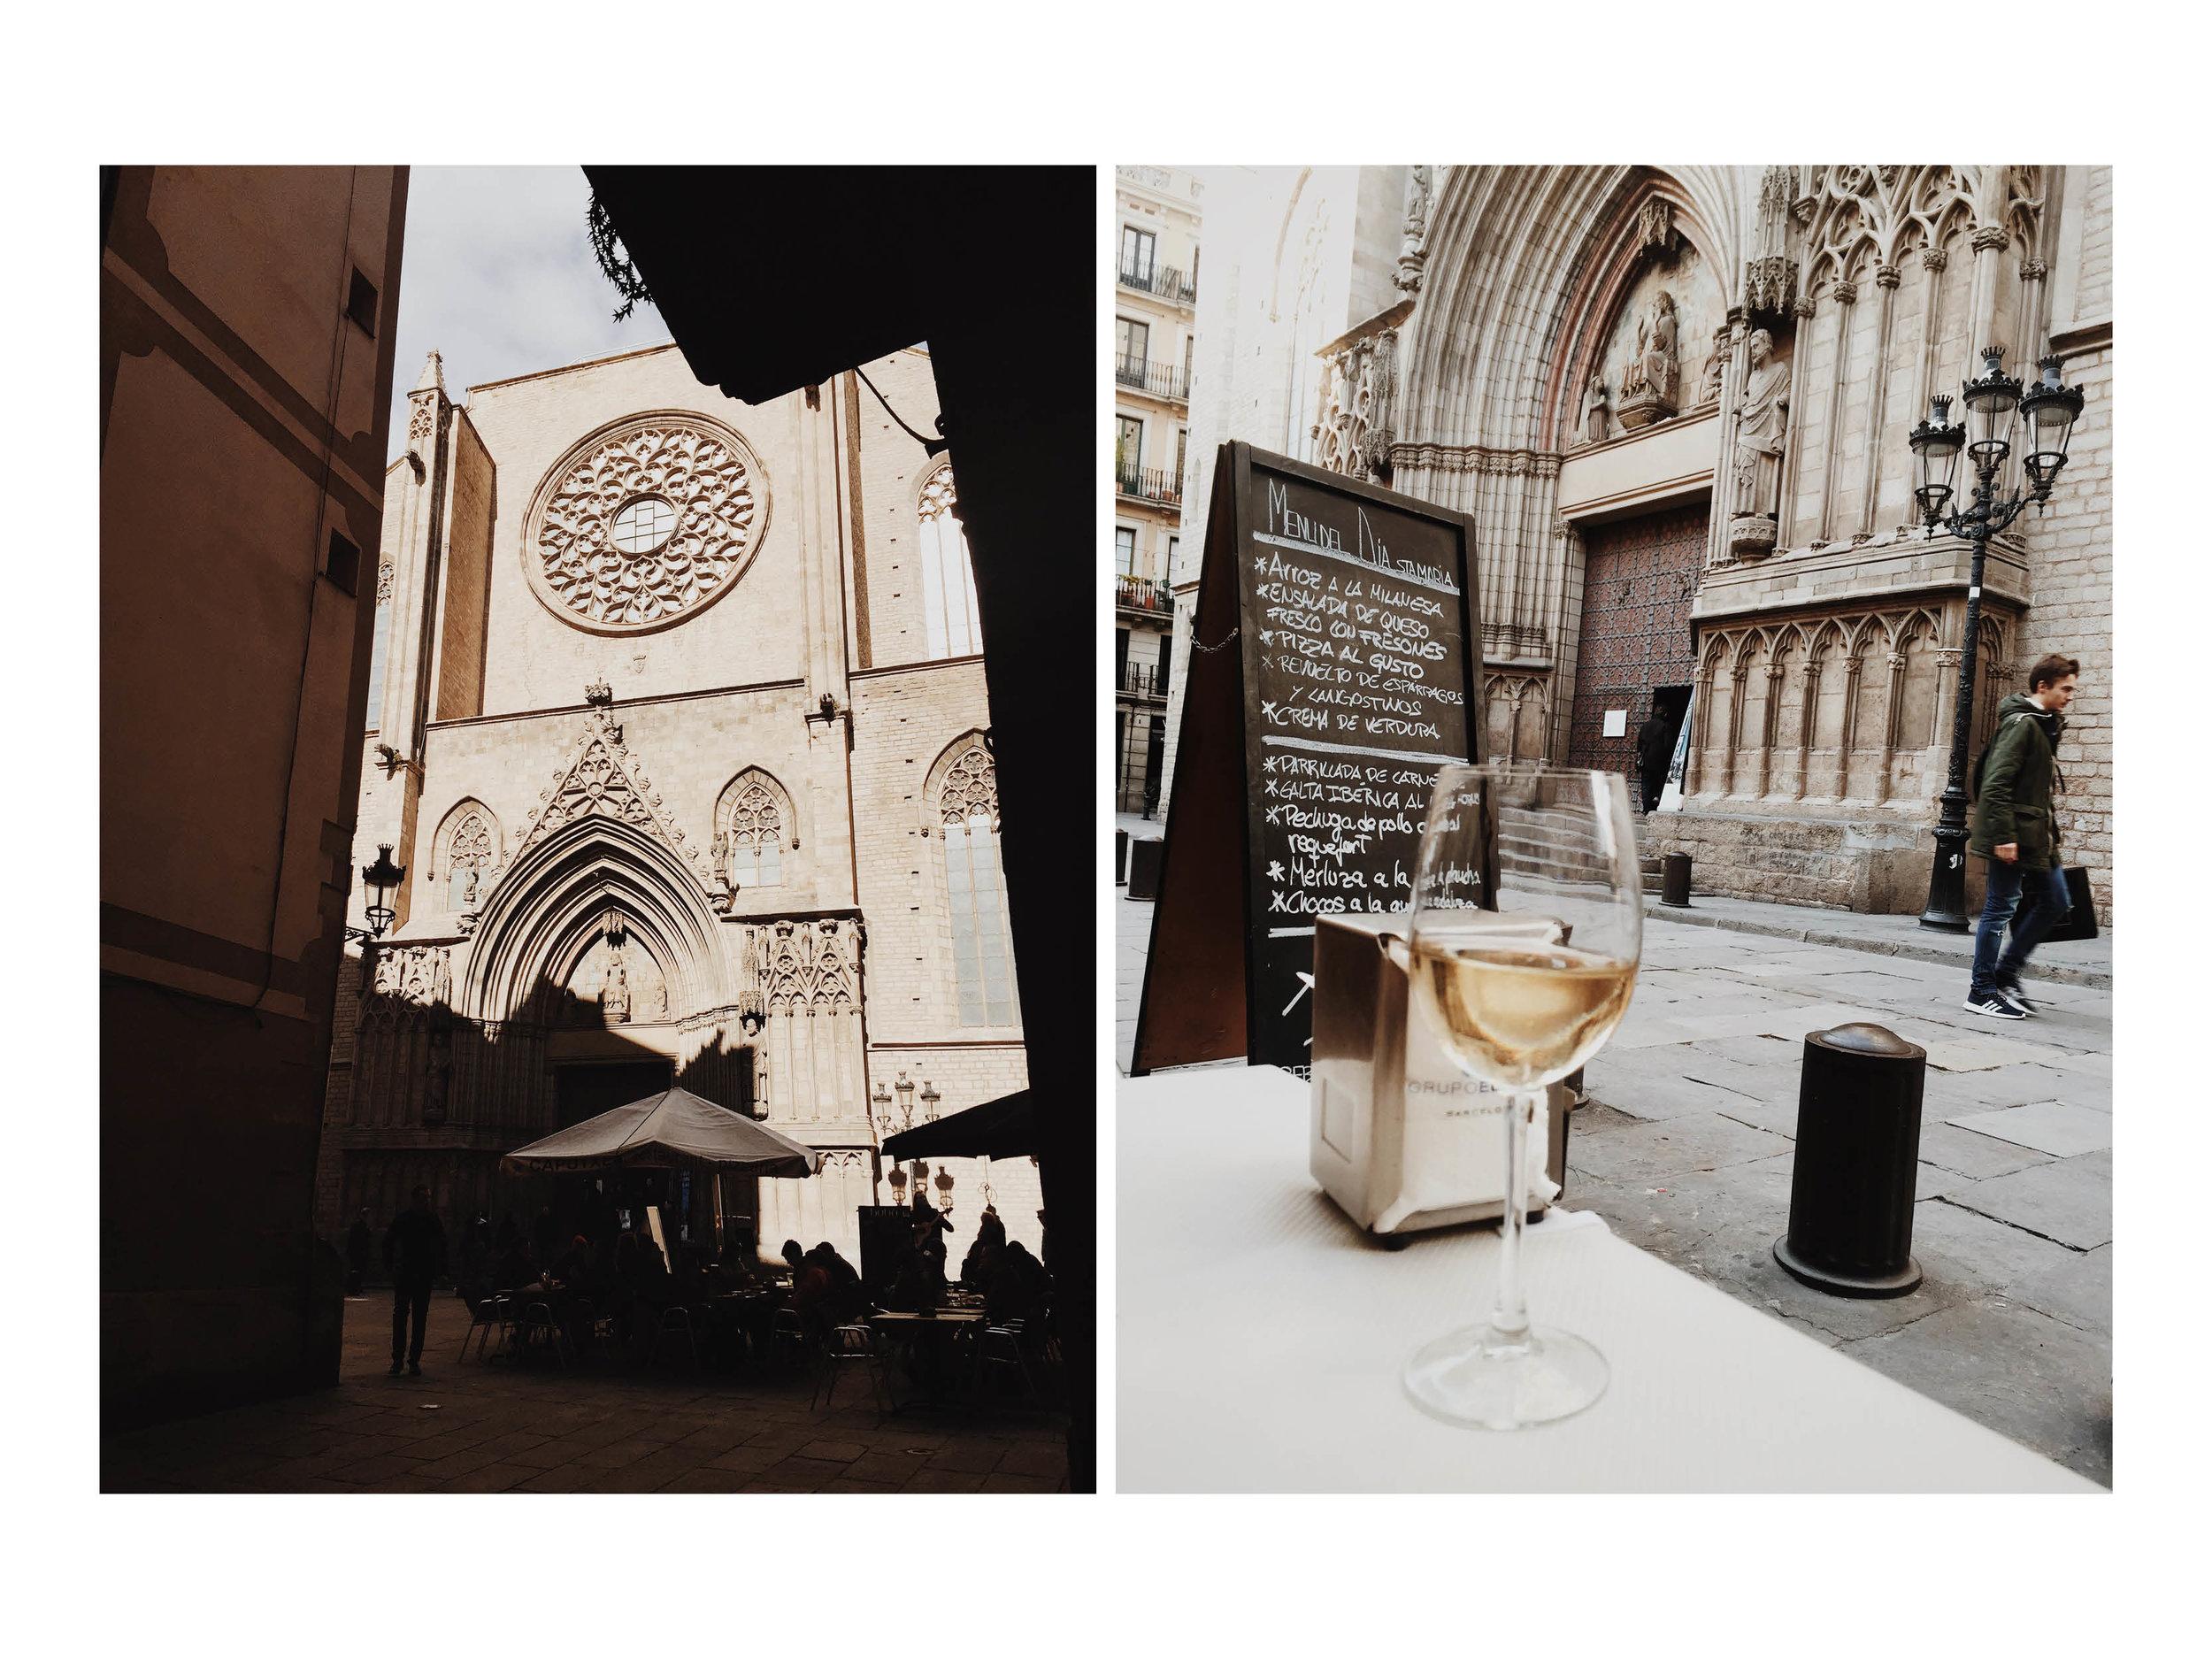 cathedraldesantamaria-collagebilde blogg